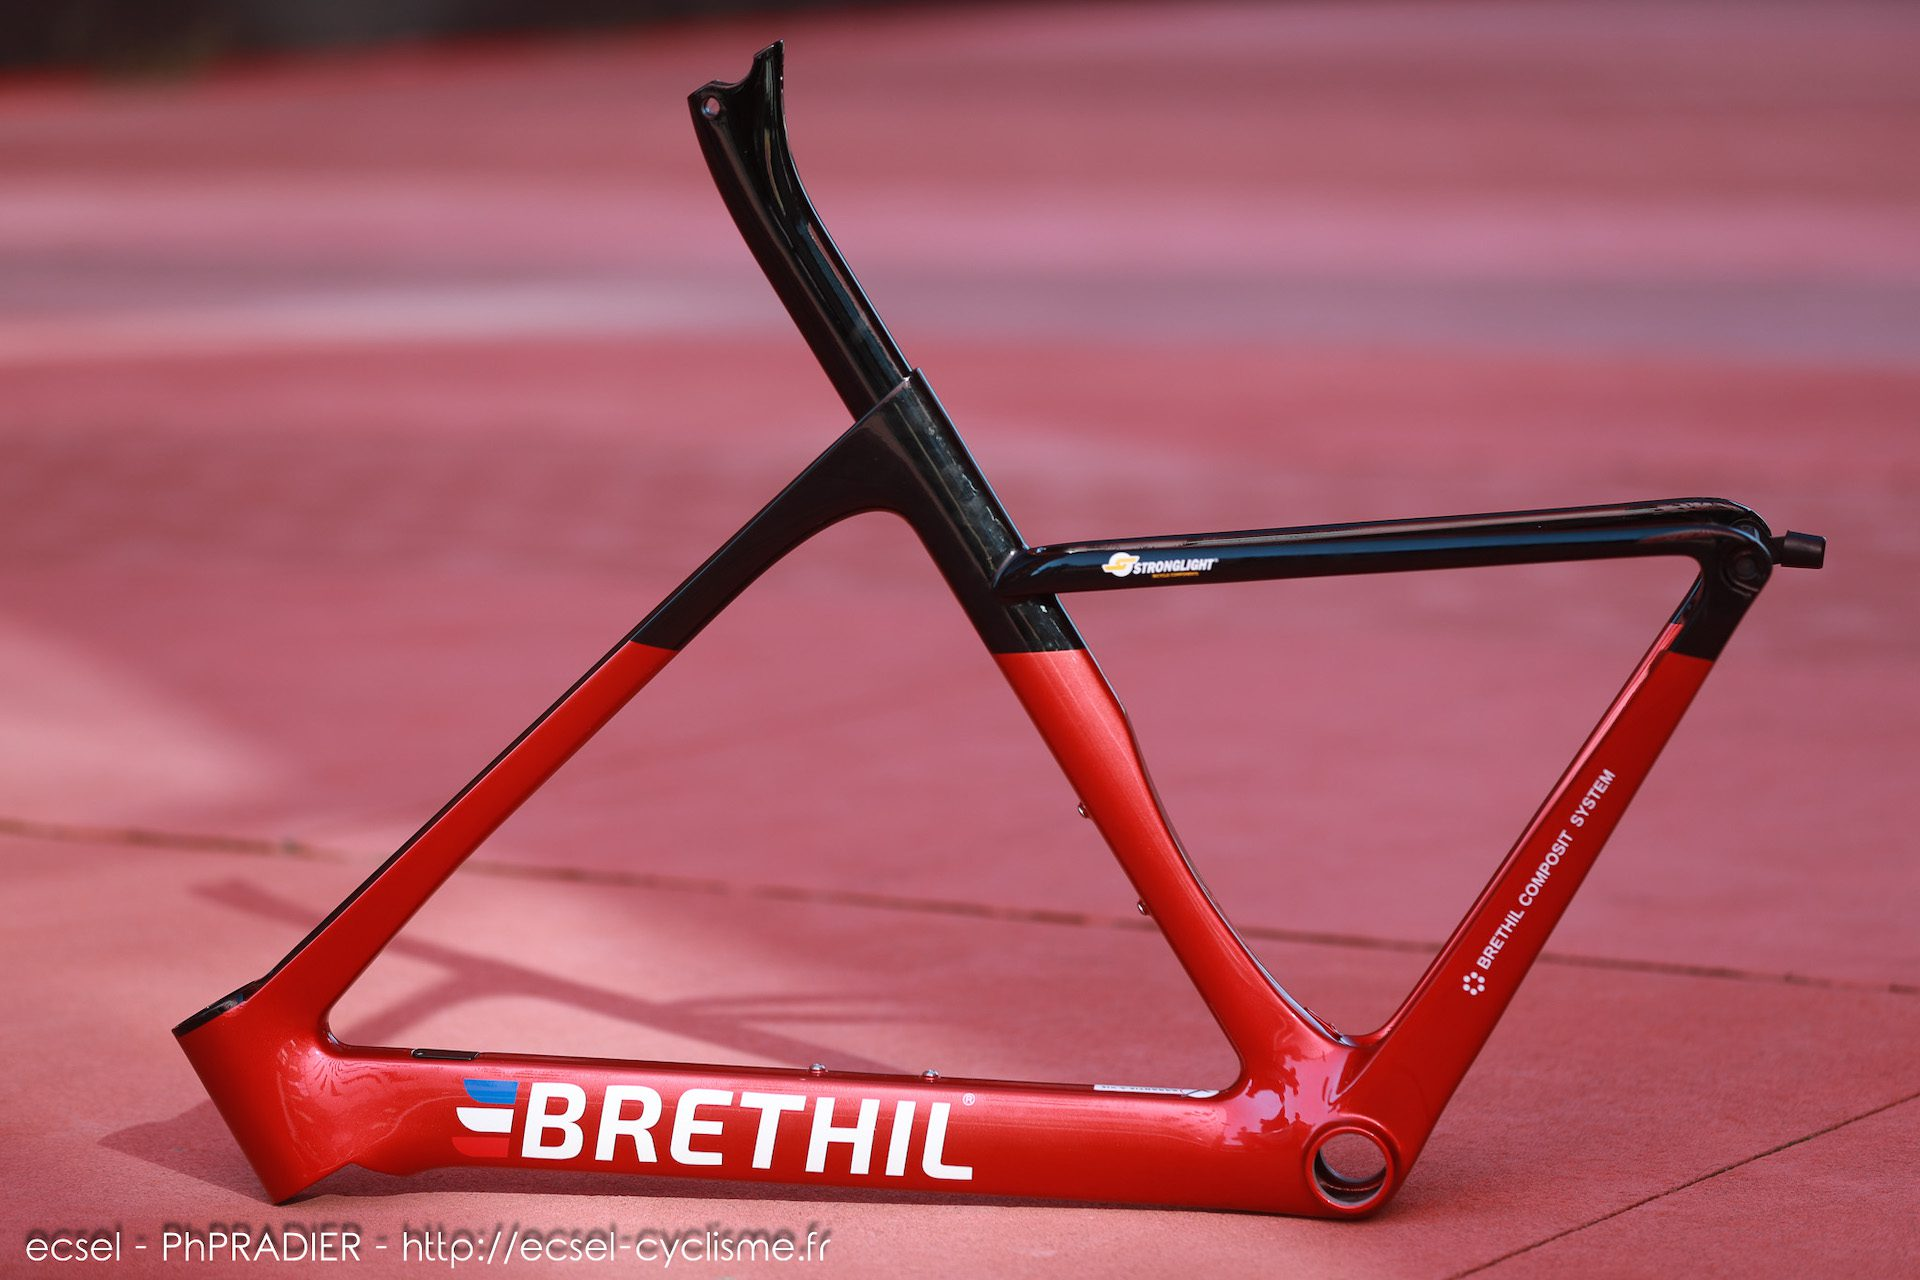 Brethil ECSEL 2022